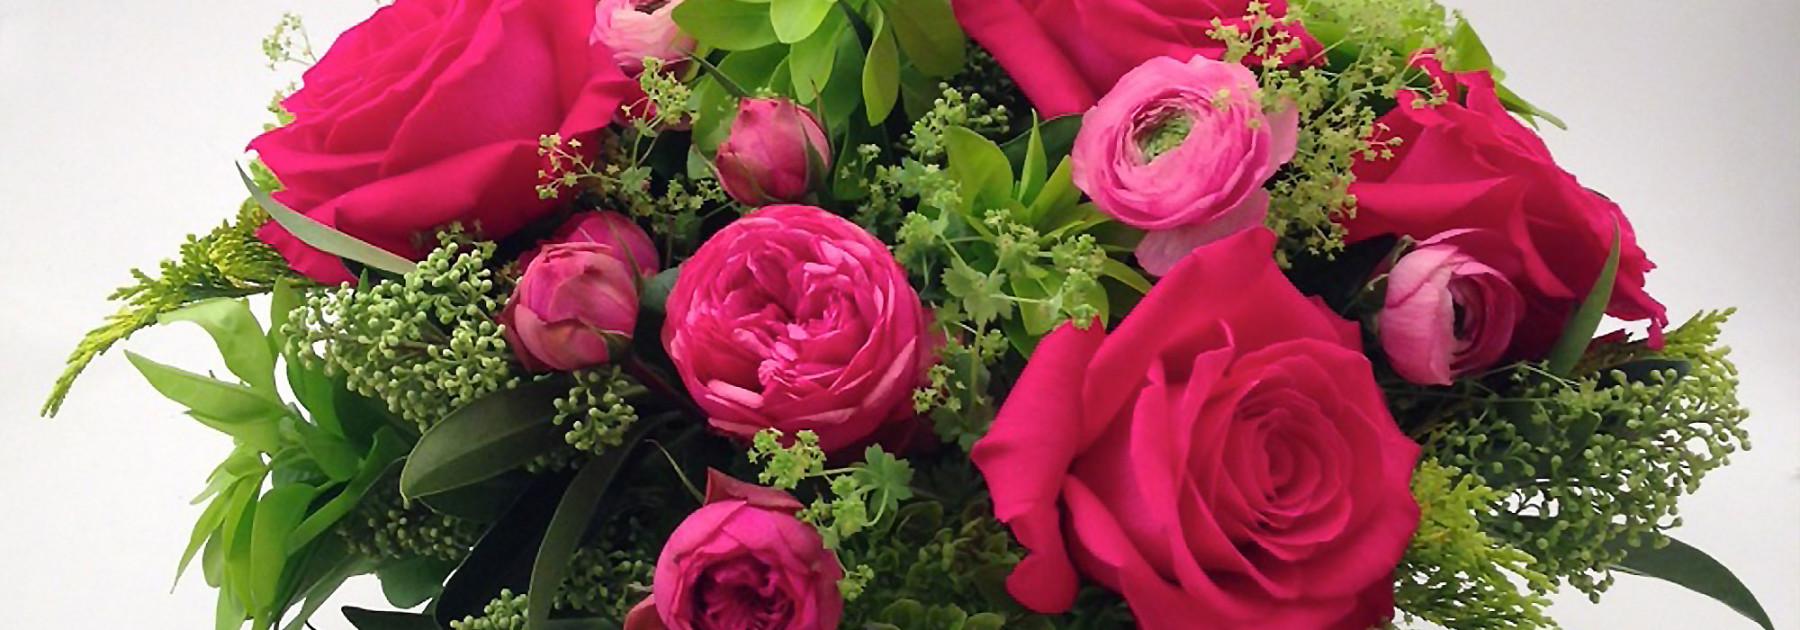 roses, artworks, flowers, delivery, valentines